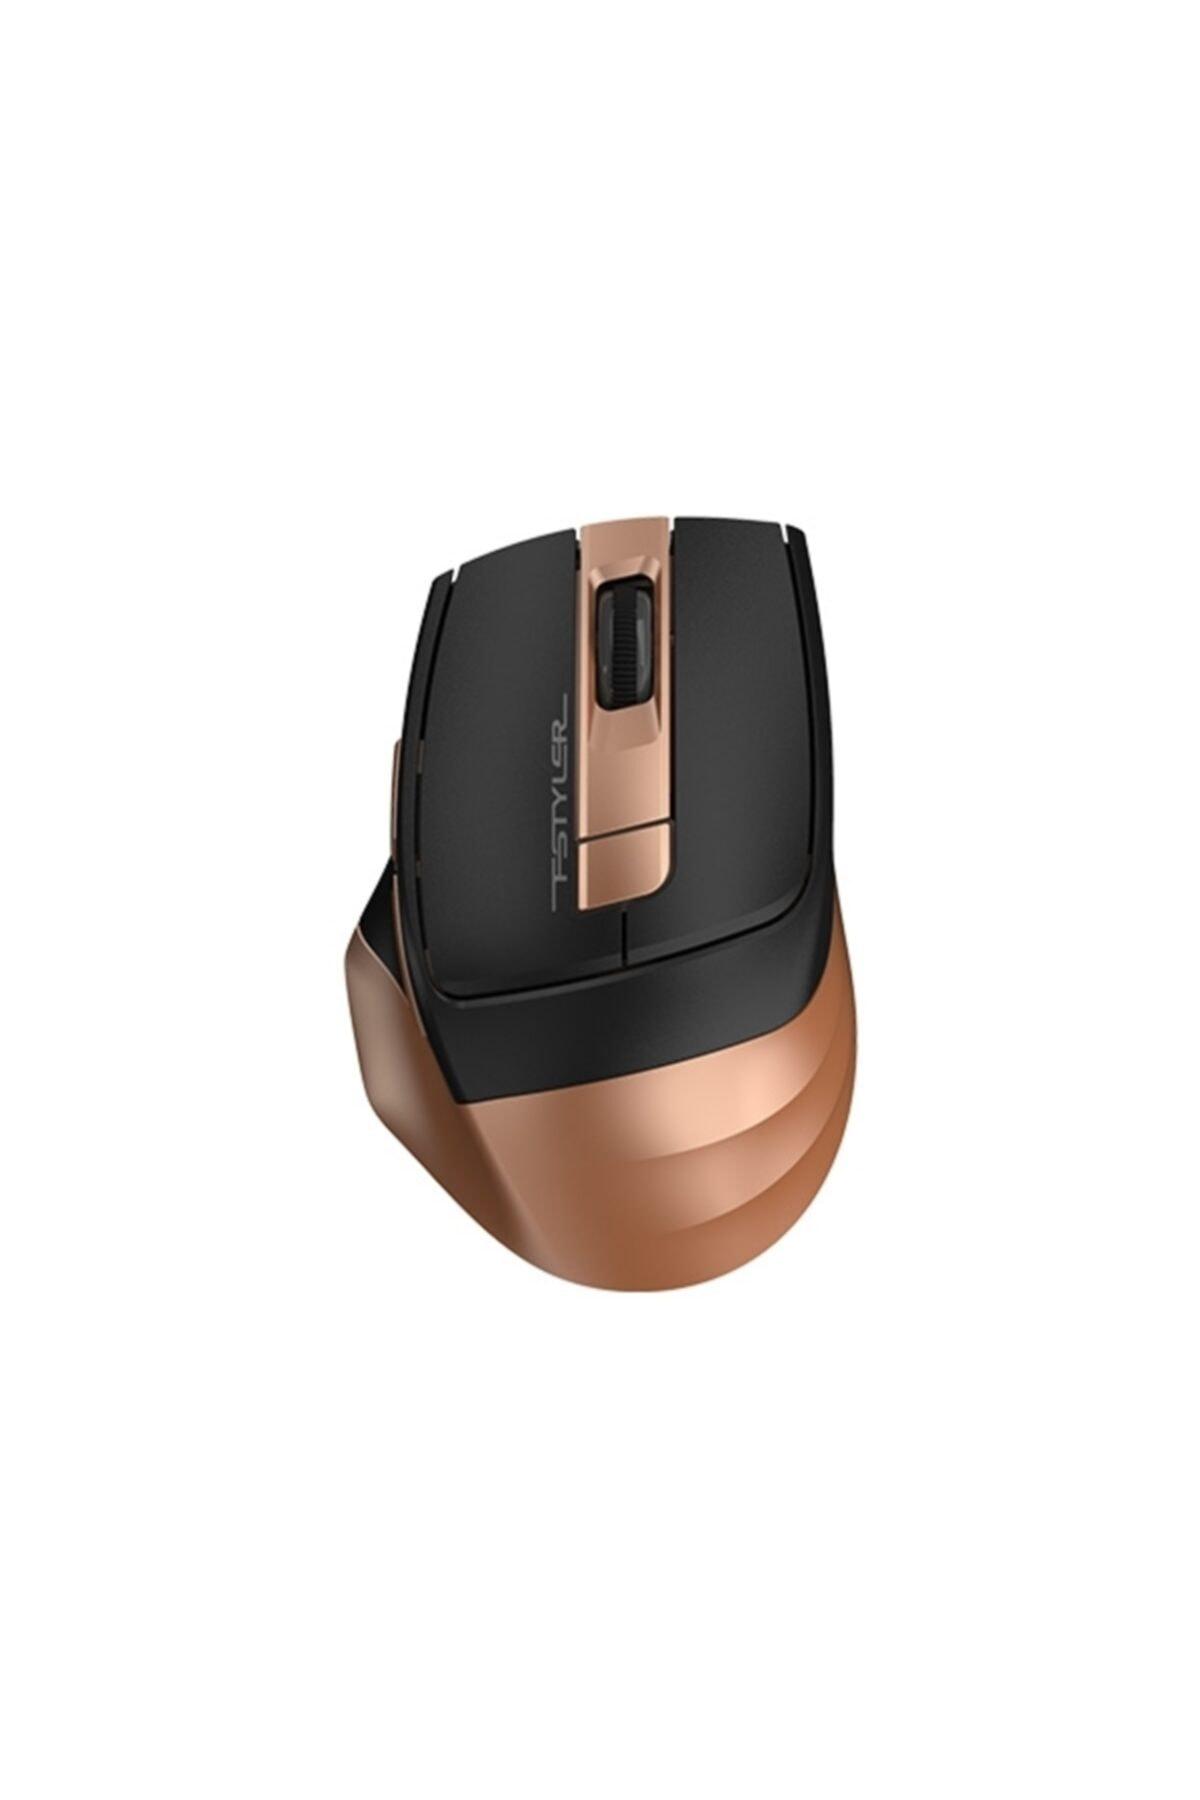 A4 Tech Fg35 Optık Mouse Nano Usb Bronz 2000 Dpı Bronz 1